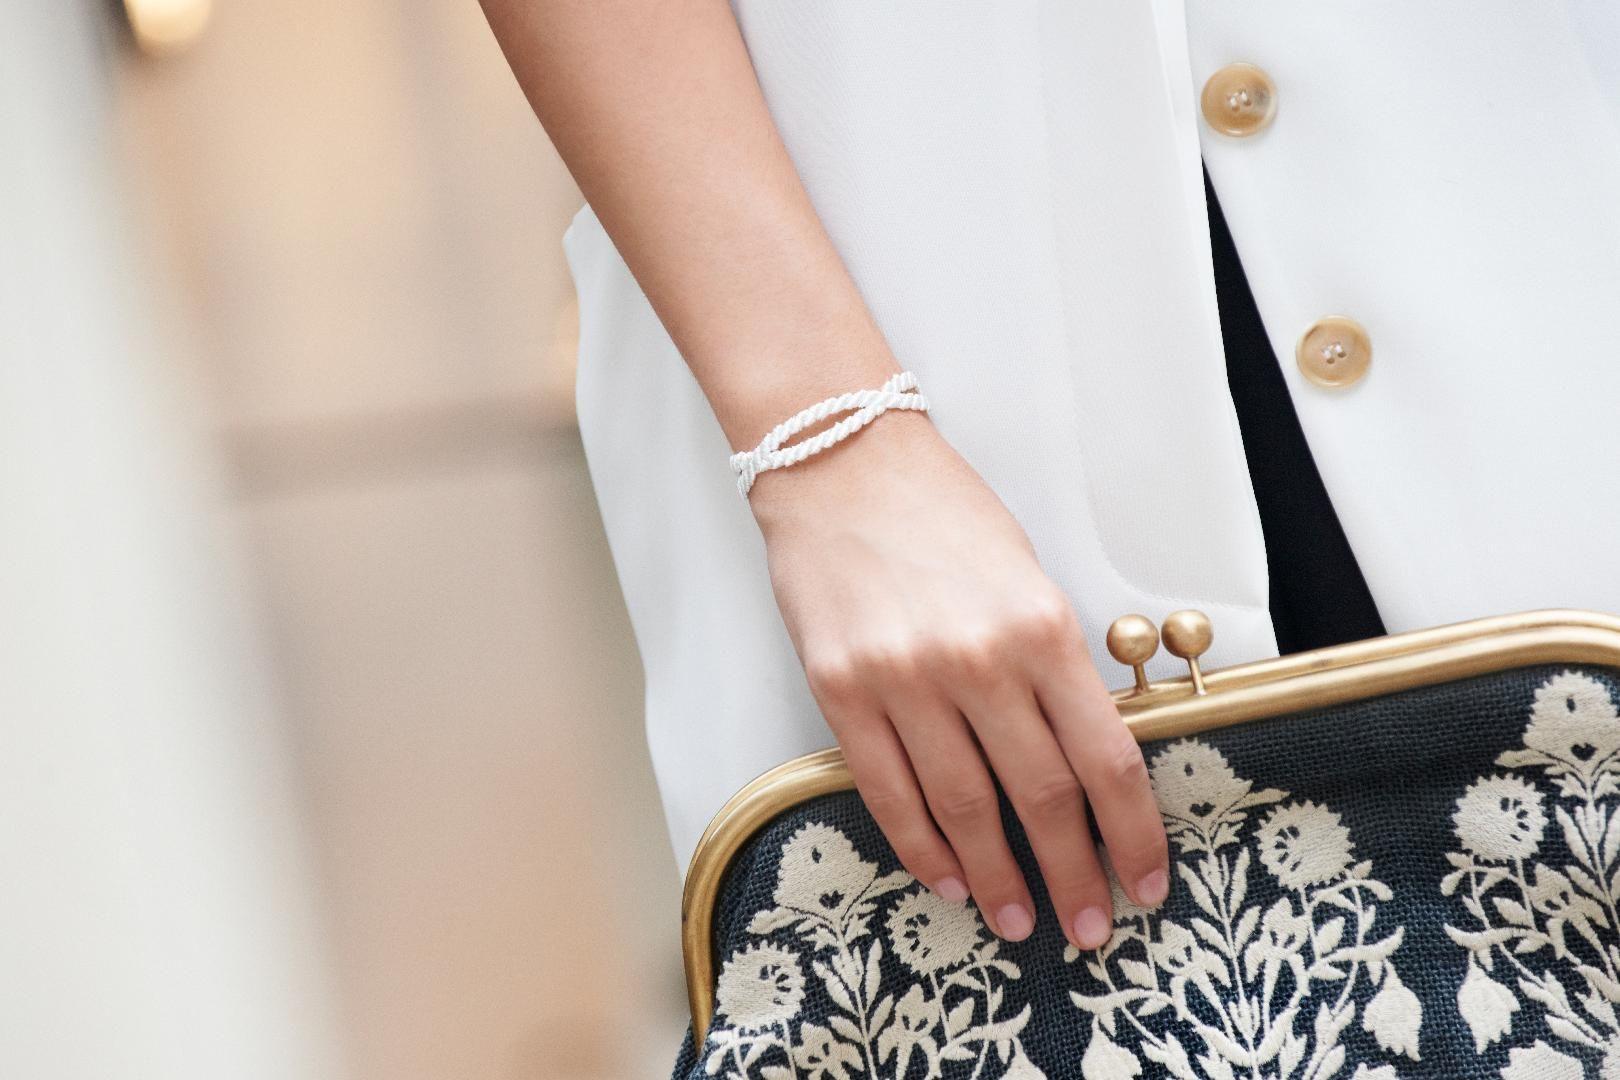 Beautiful Missiu Love Lace Bracelet. So chic!